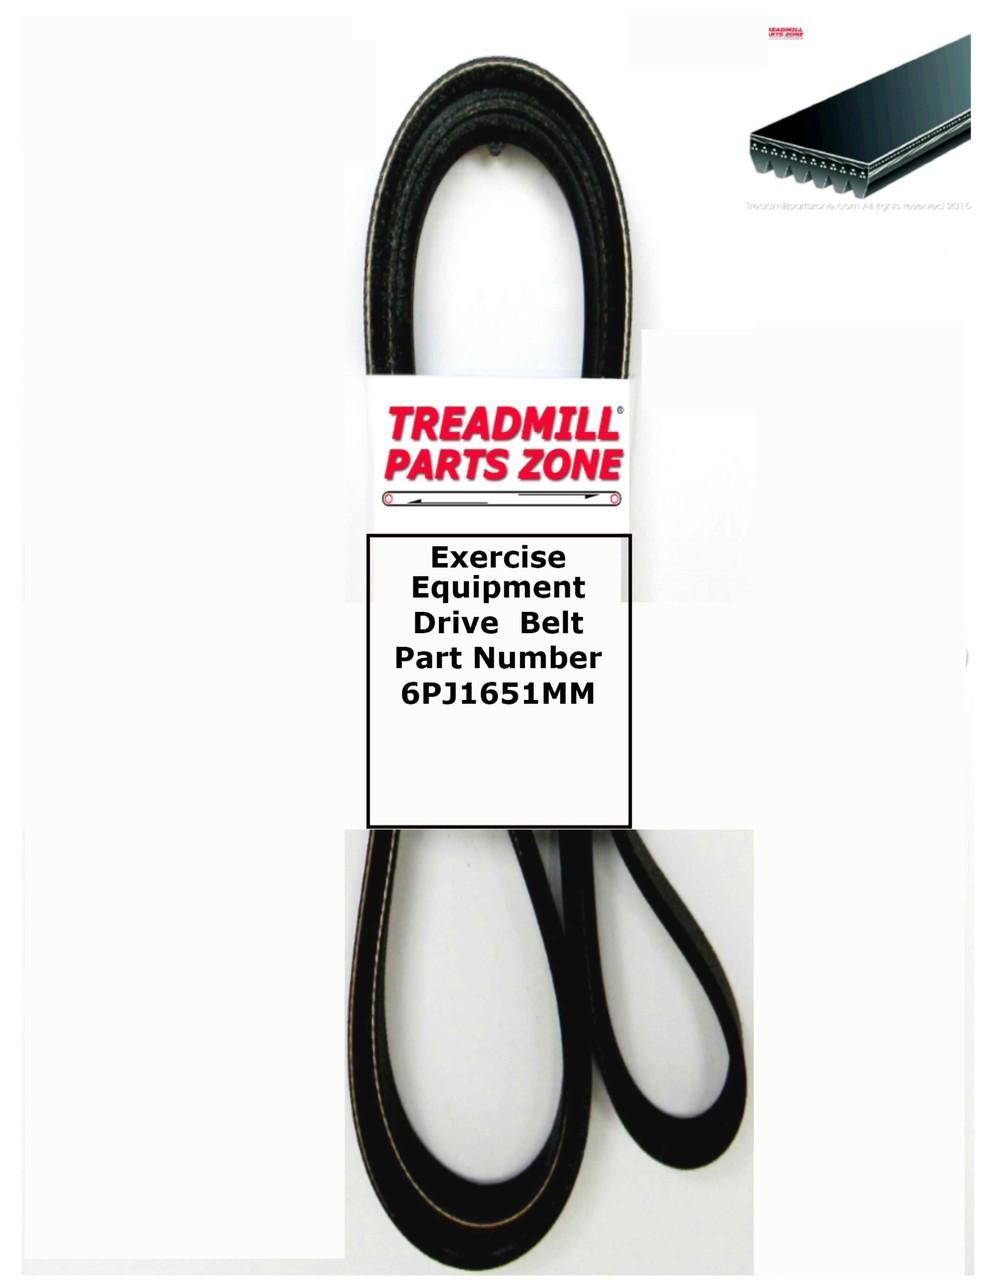 Exercise Equipment Drive  Belt Part Number 6PJ1651MM